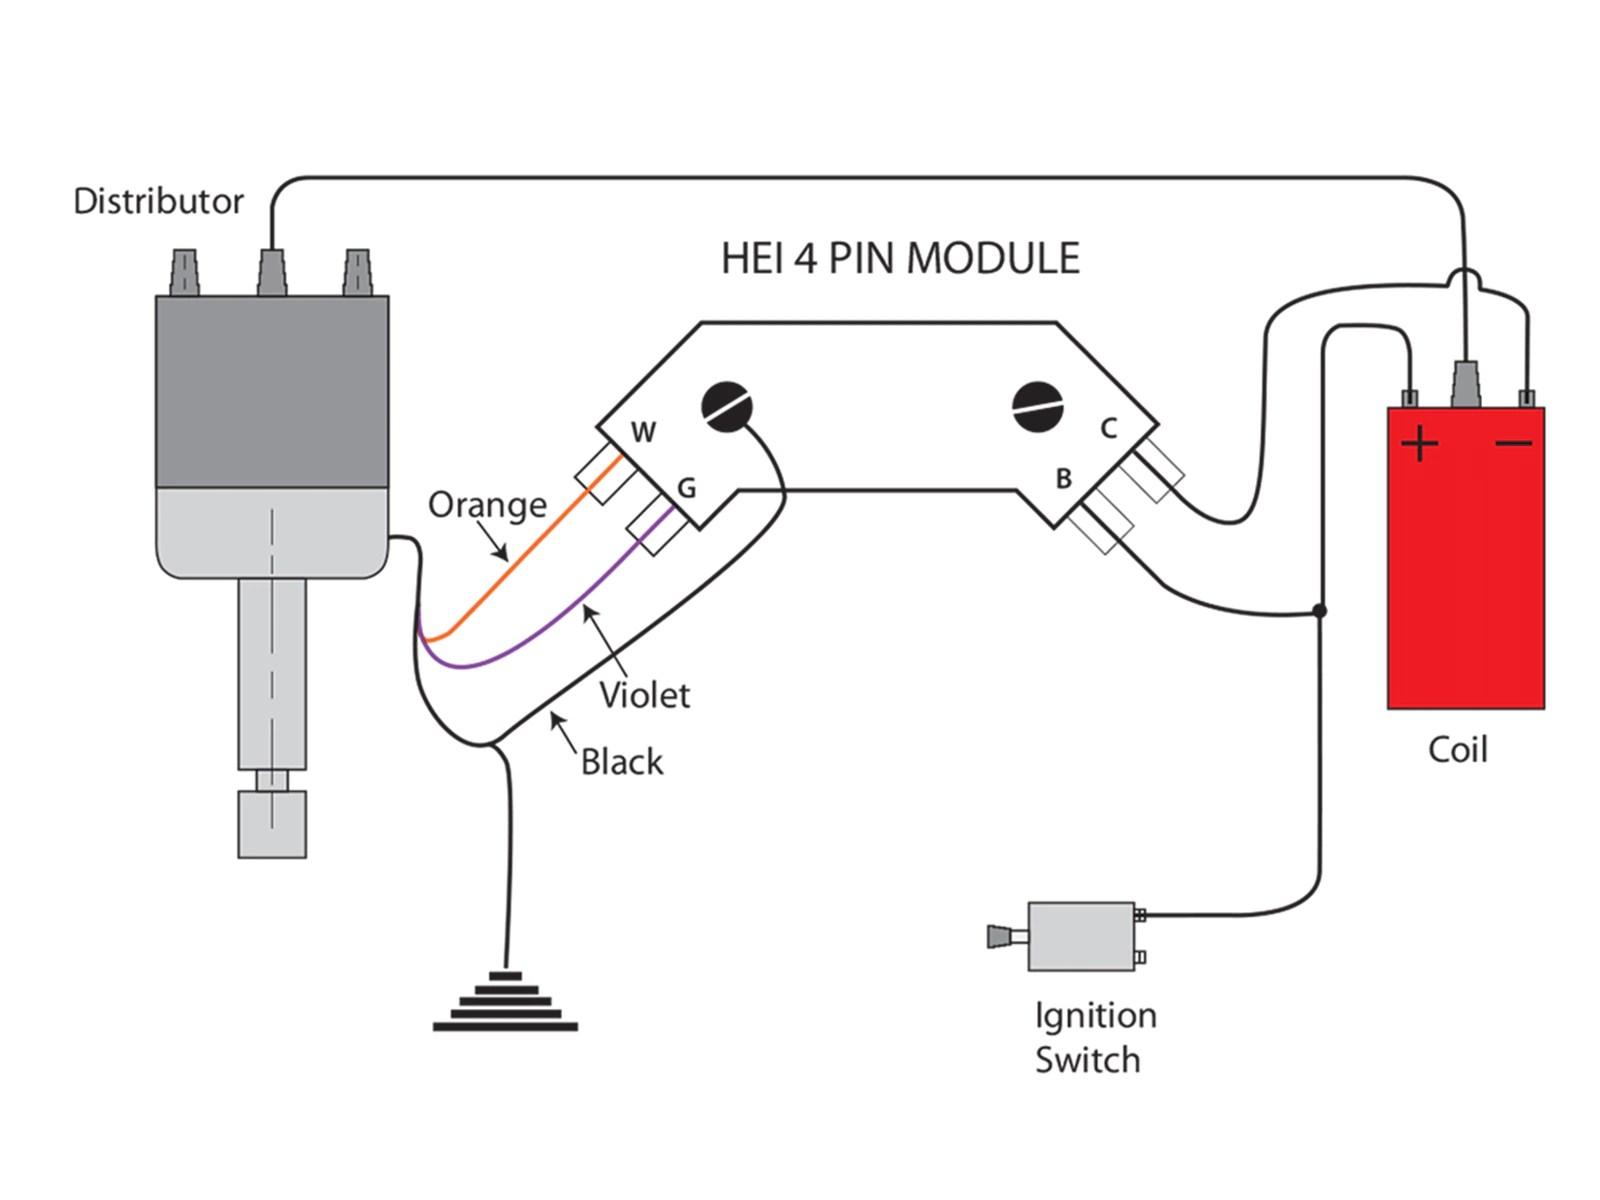 Chevy Starter Solenoid Wiring Diagram Hei. Chevy Starter Wiring Diagram Hei For A 350 Motor Moreover. Jeep. Jeep Cj7 Starter Solenoid Wiring At Scoala.co